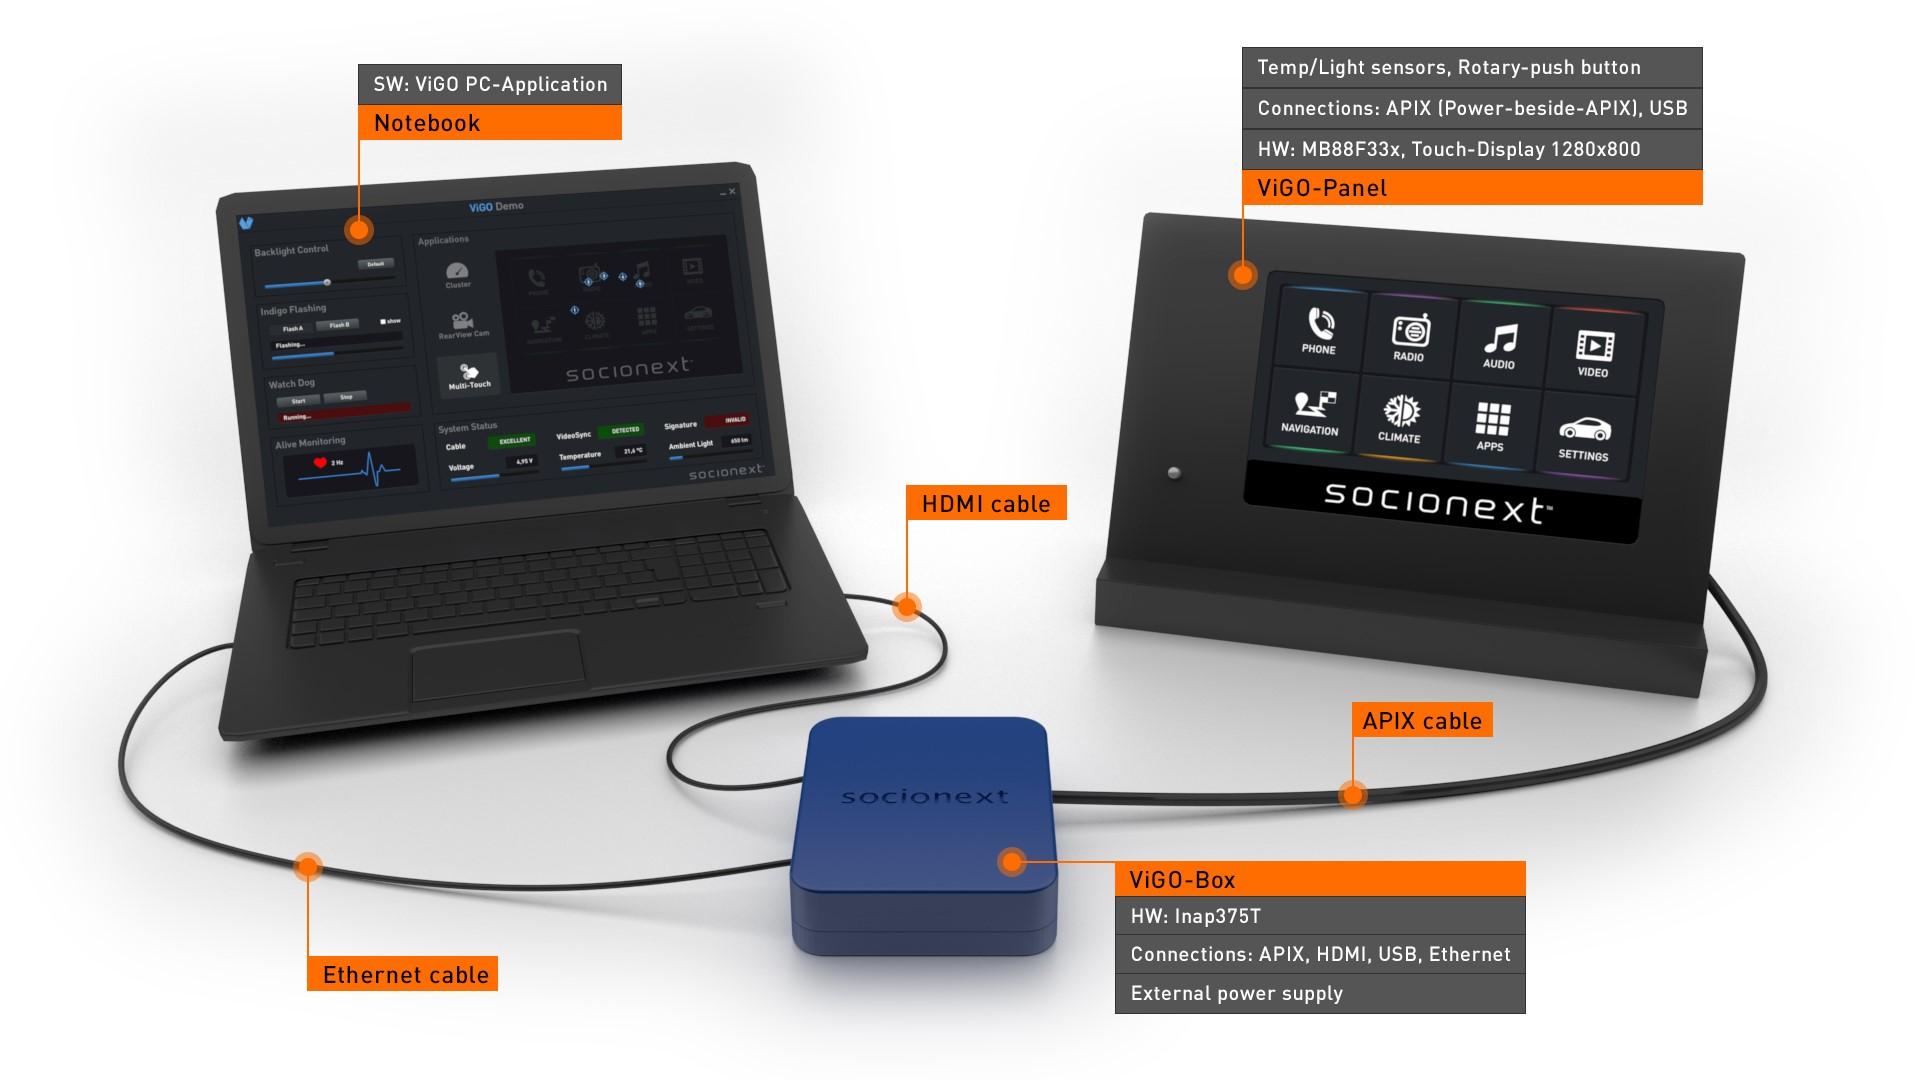 ELIV (Electronics In Vehicles) ViGO Remote Display Automotive